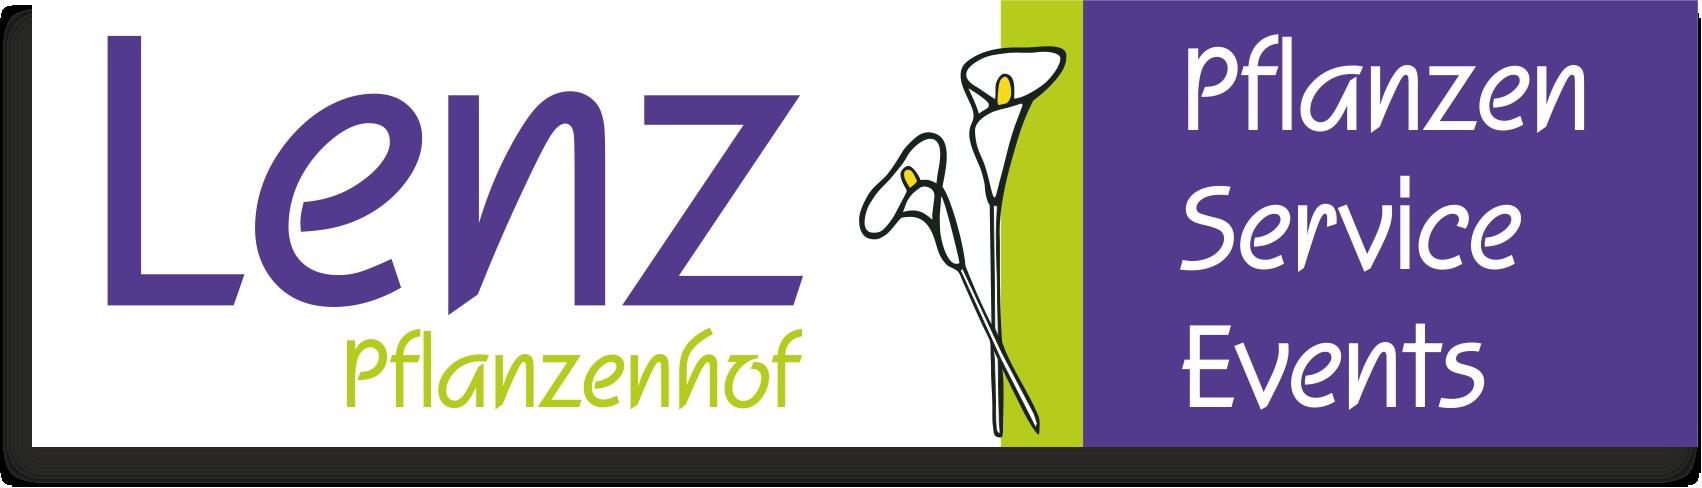 Pflanzenhof Lenz